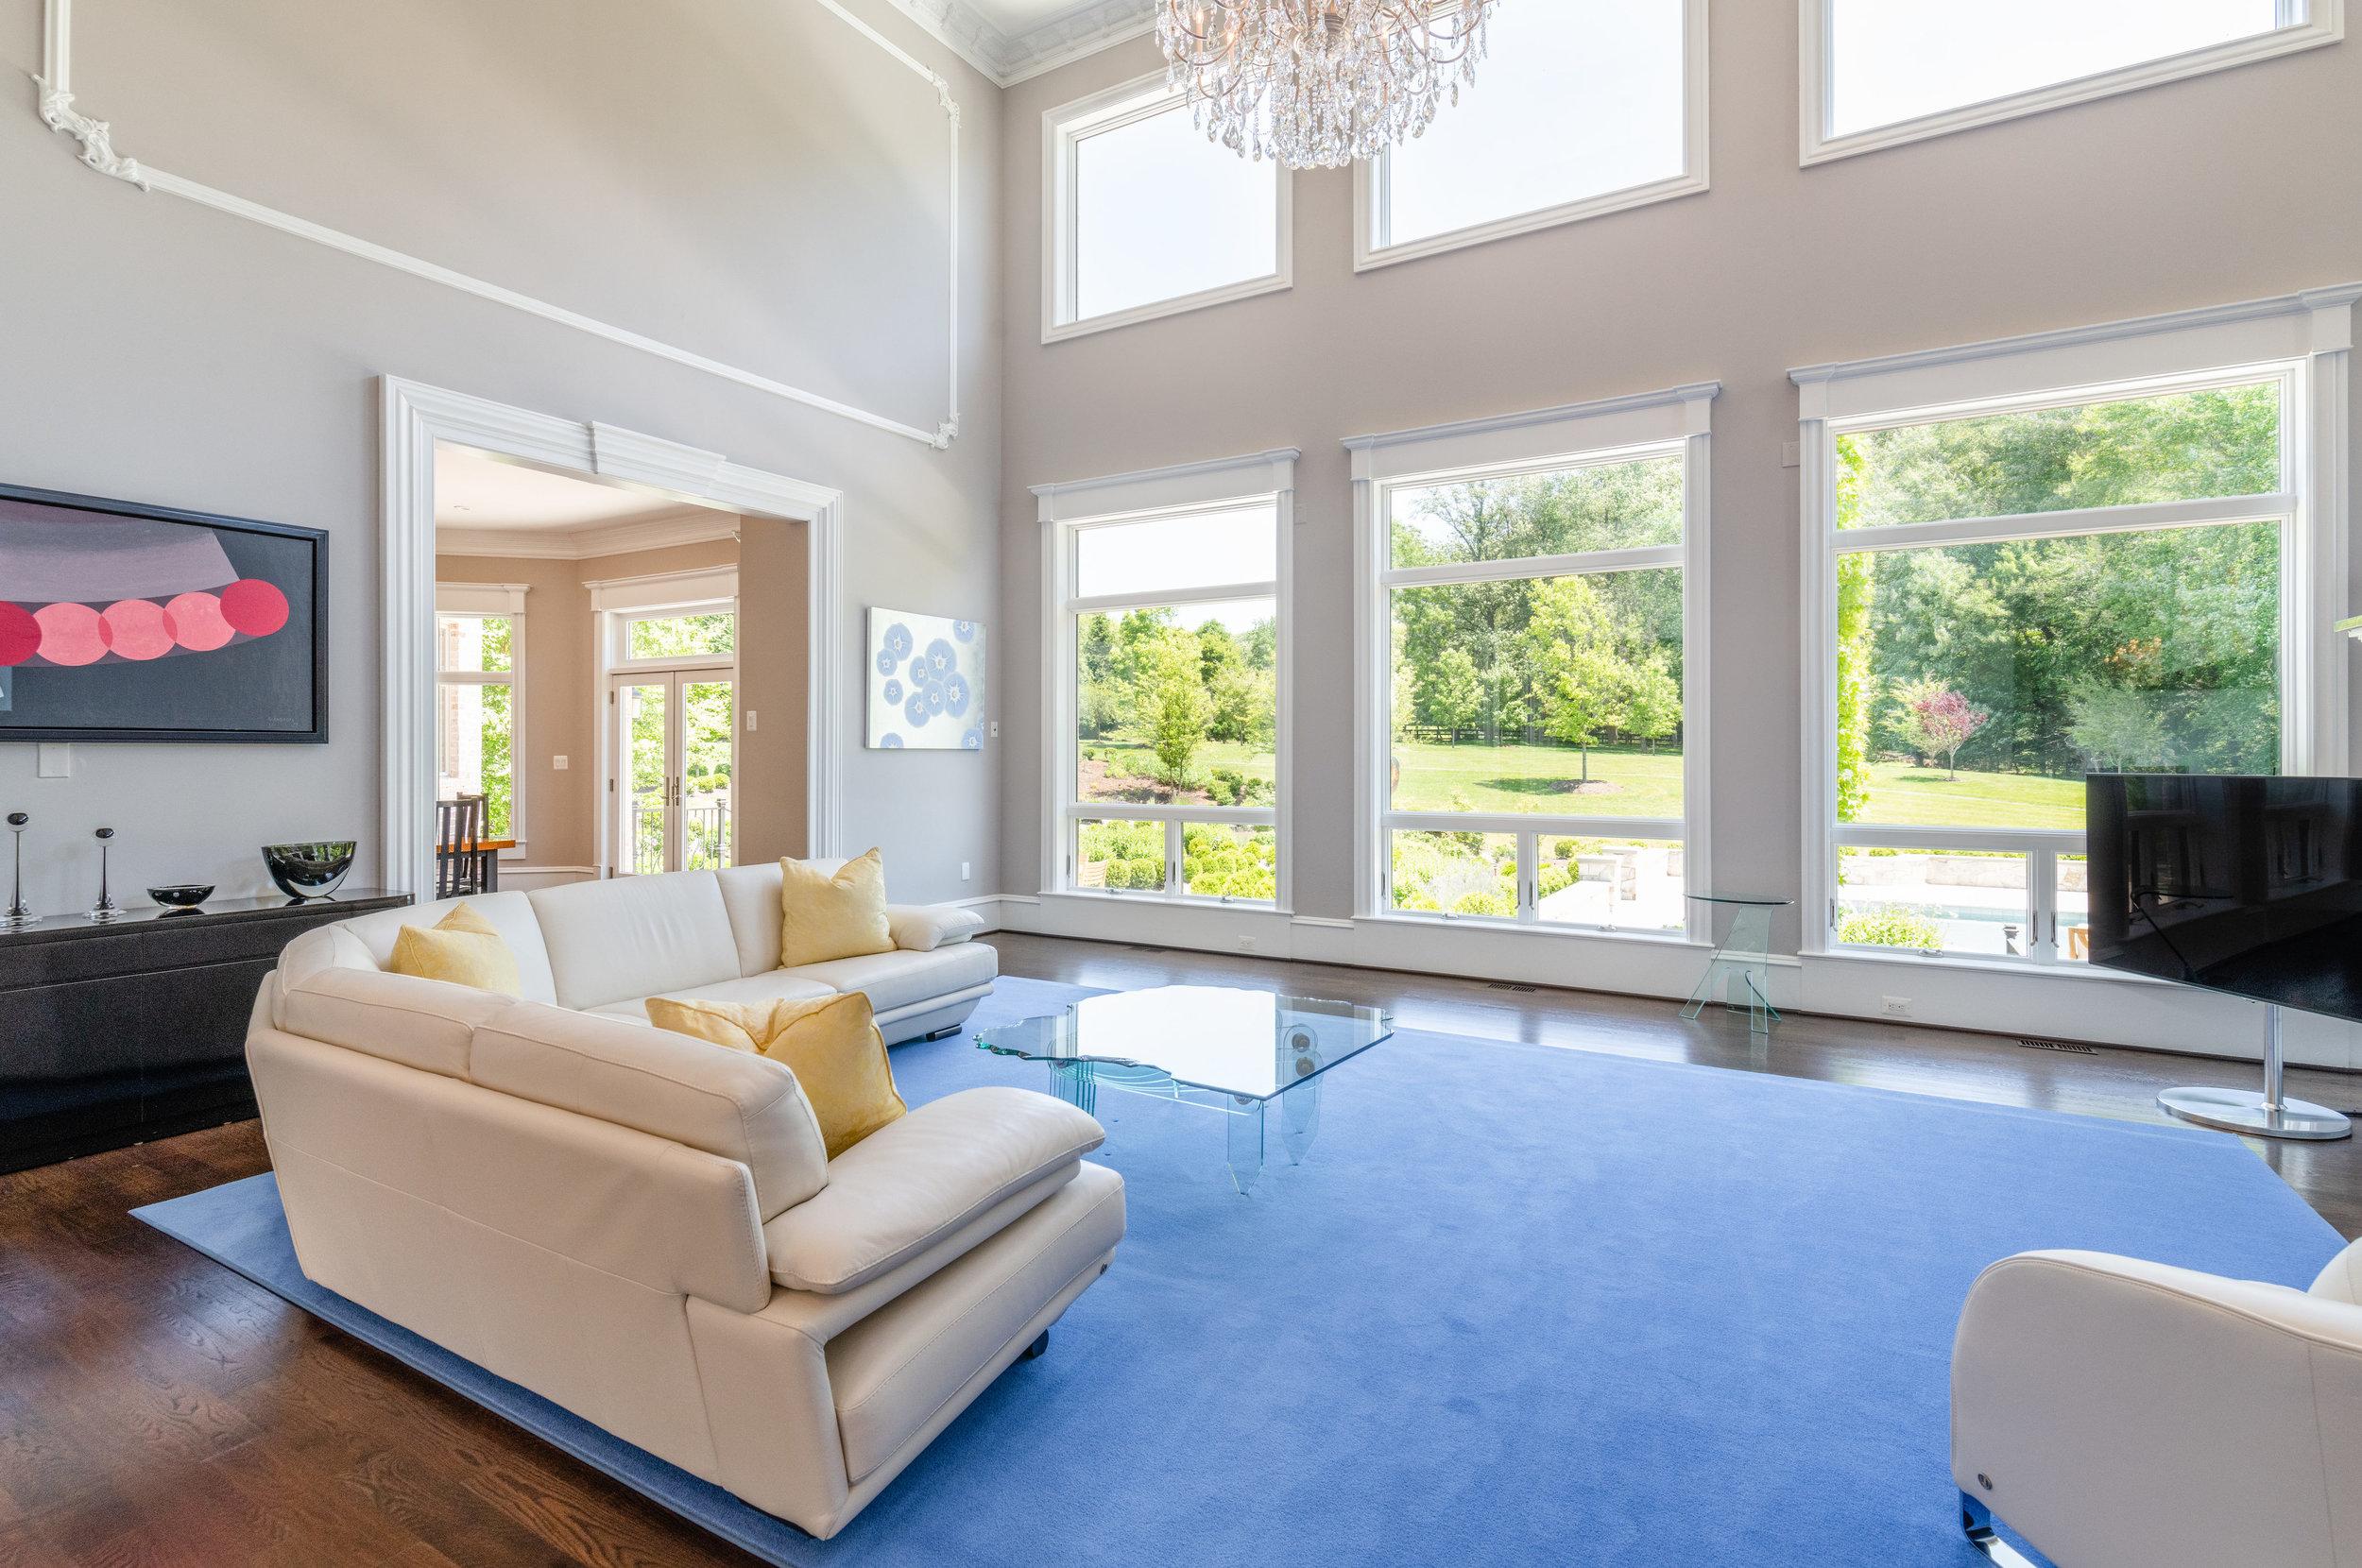 Family Room overlooks garden and pool